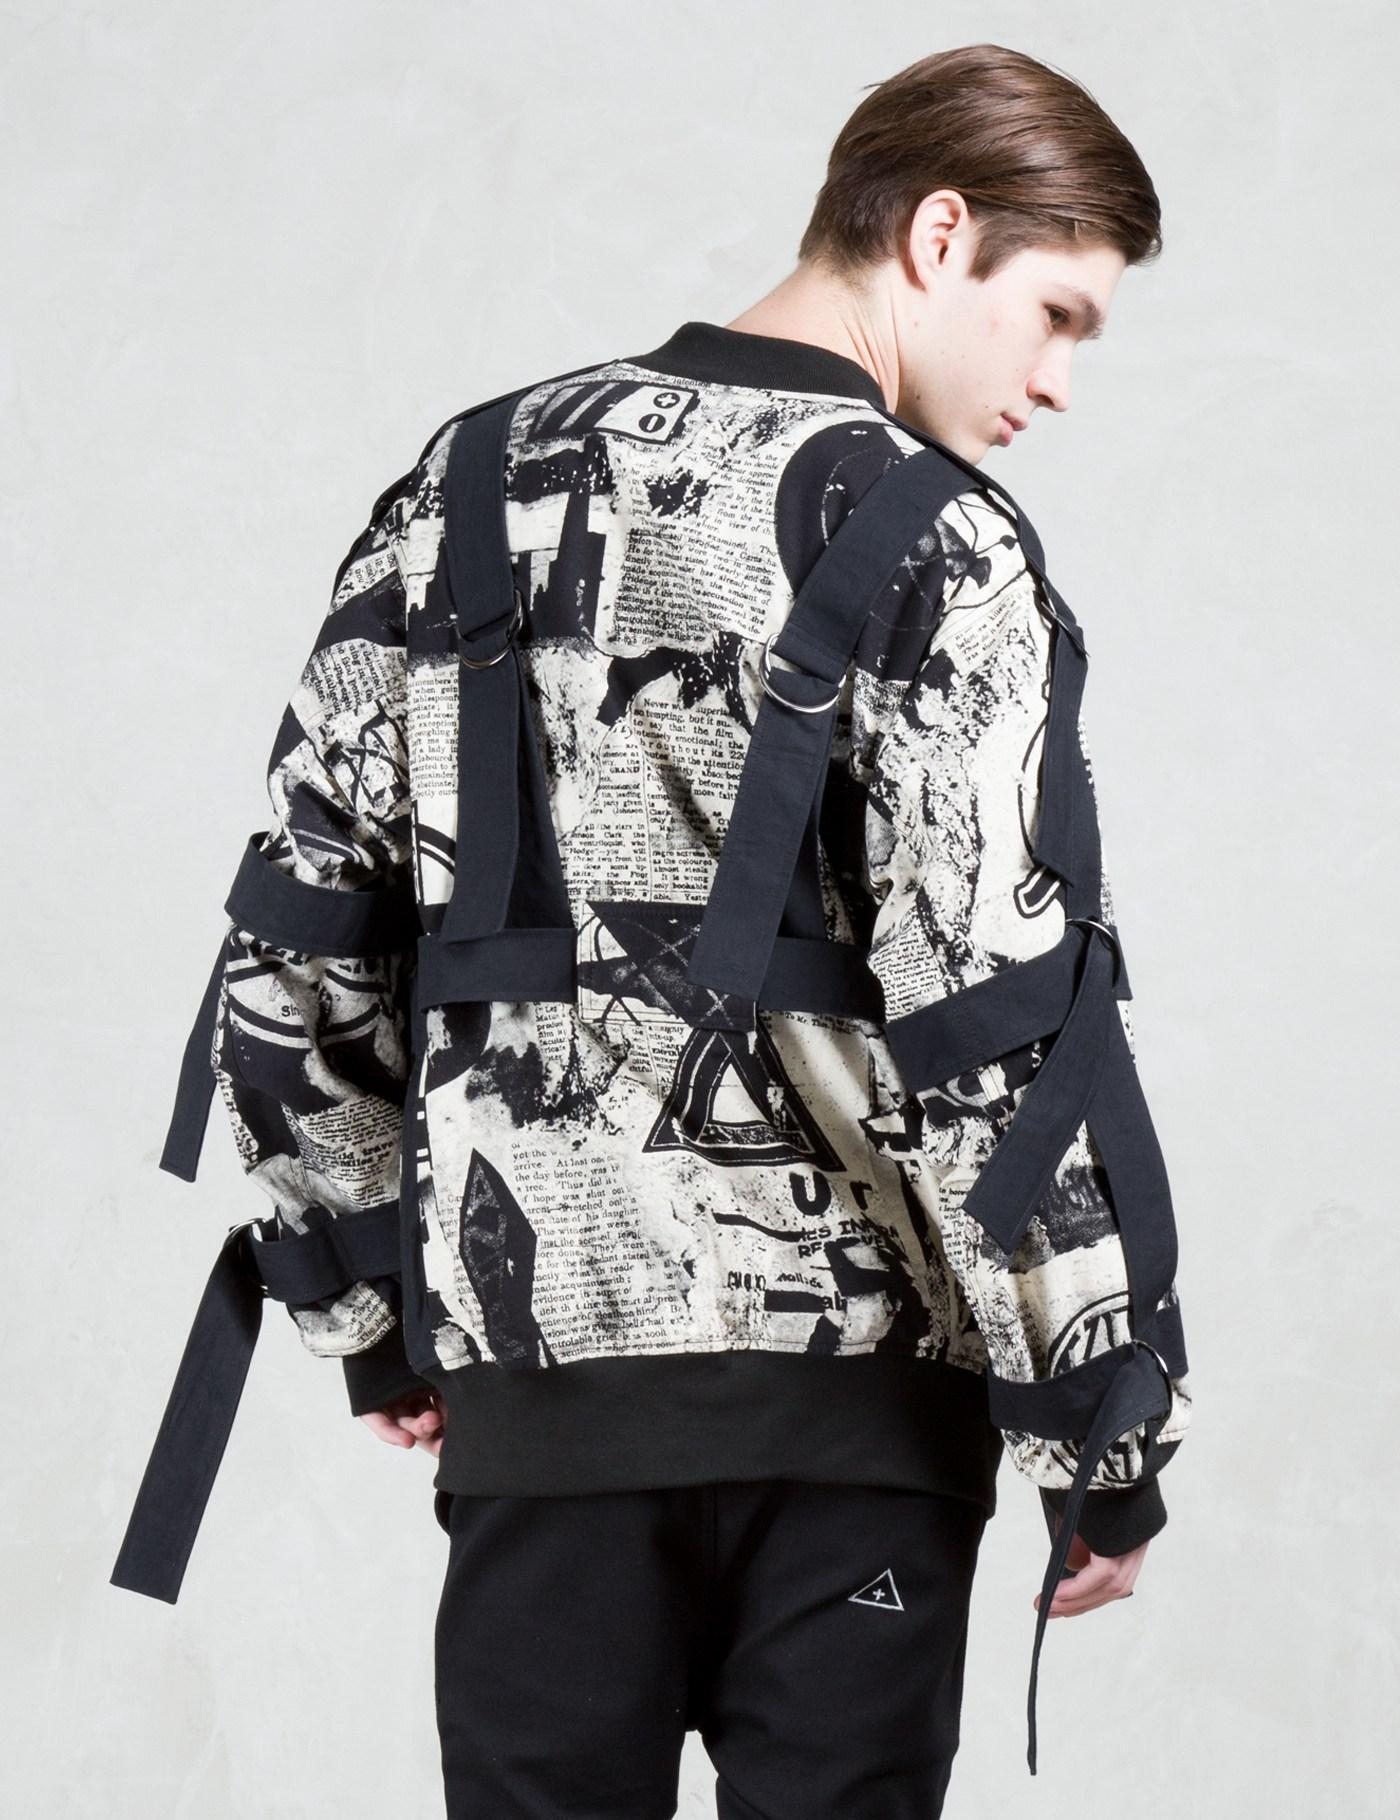 KTZ Cotton Newspaper Print Bomber Jacket W/ Bondage Detail for Men